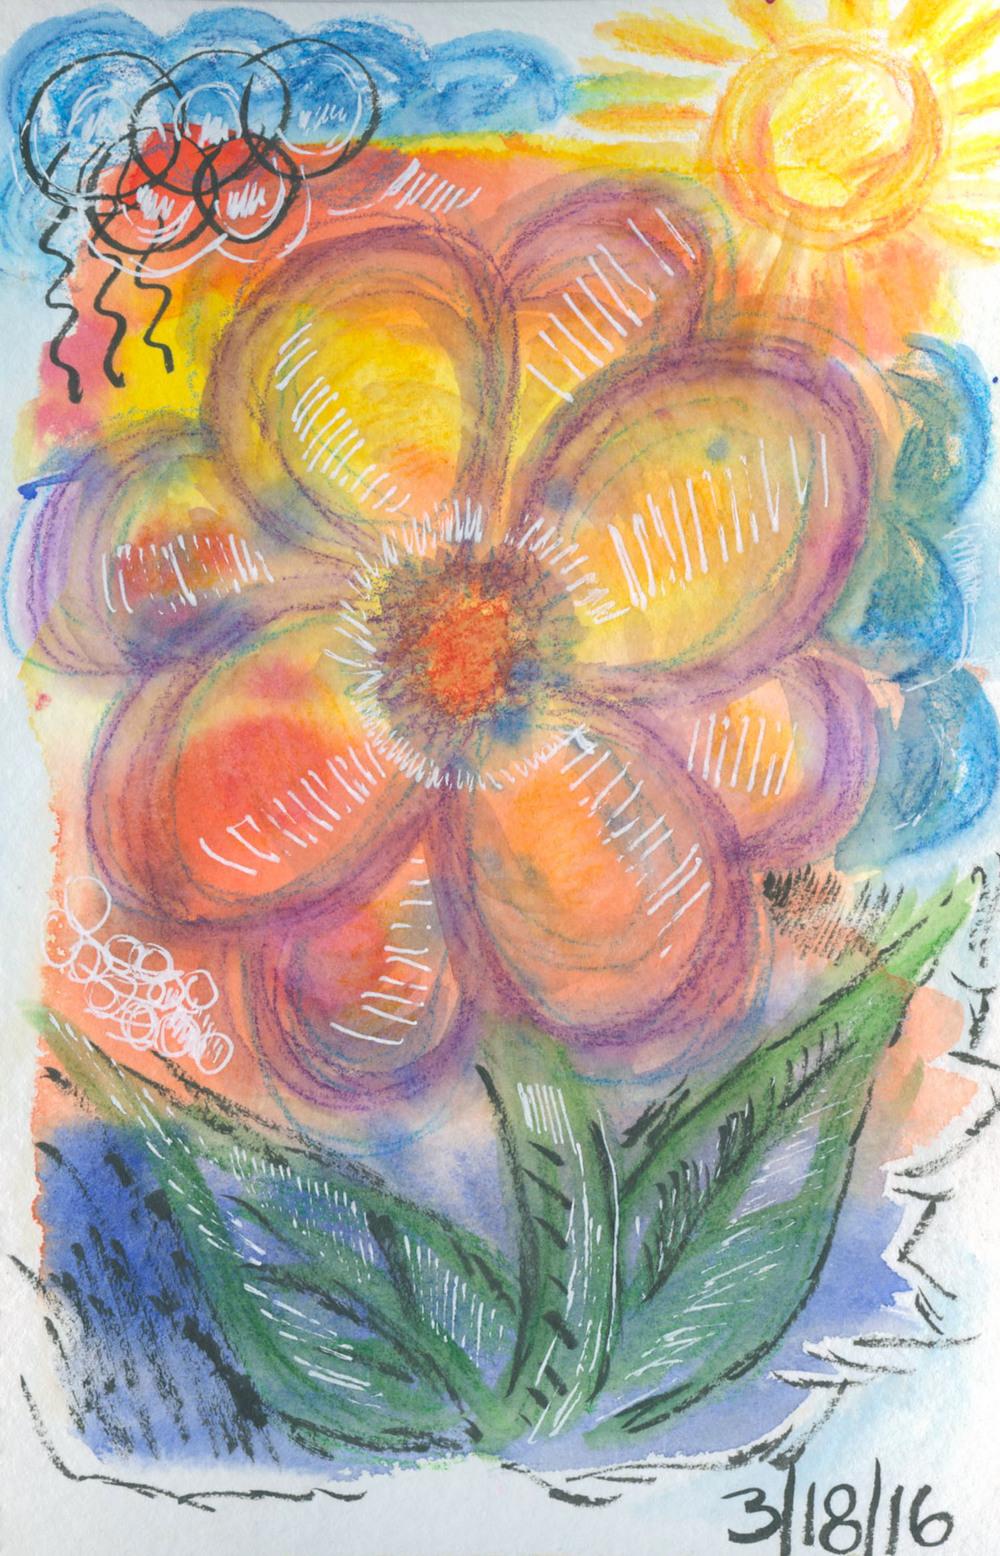 doodle_flower_3-18-16.jpg